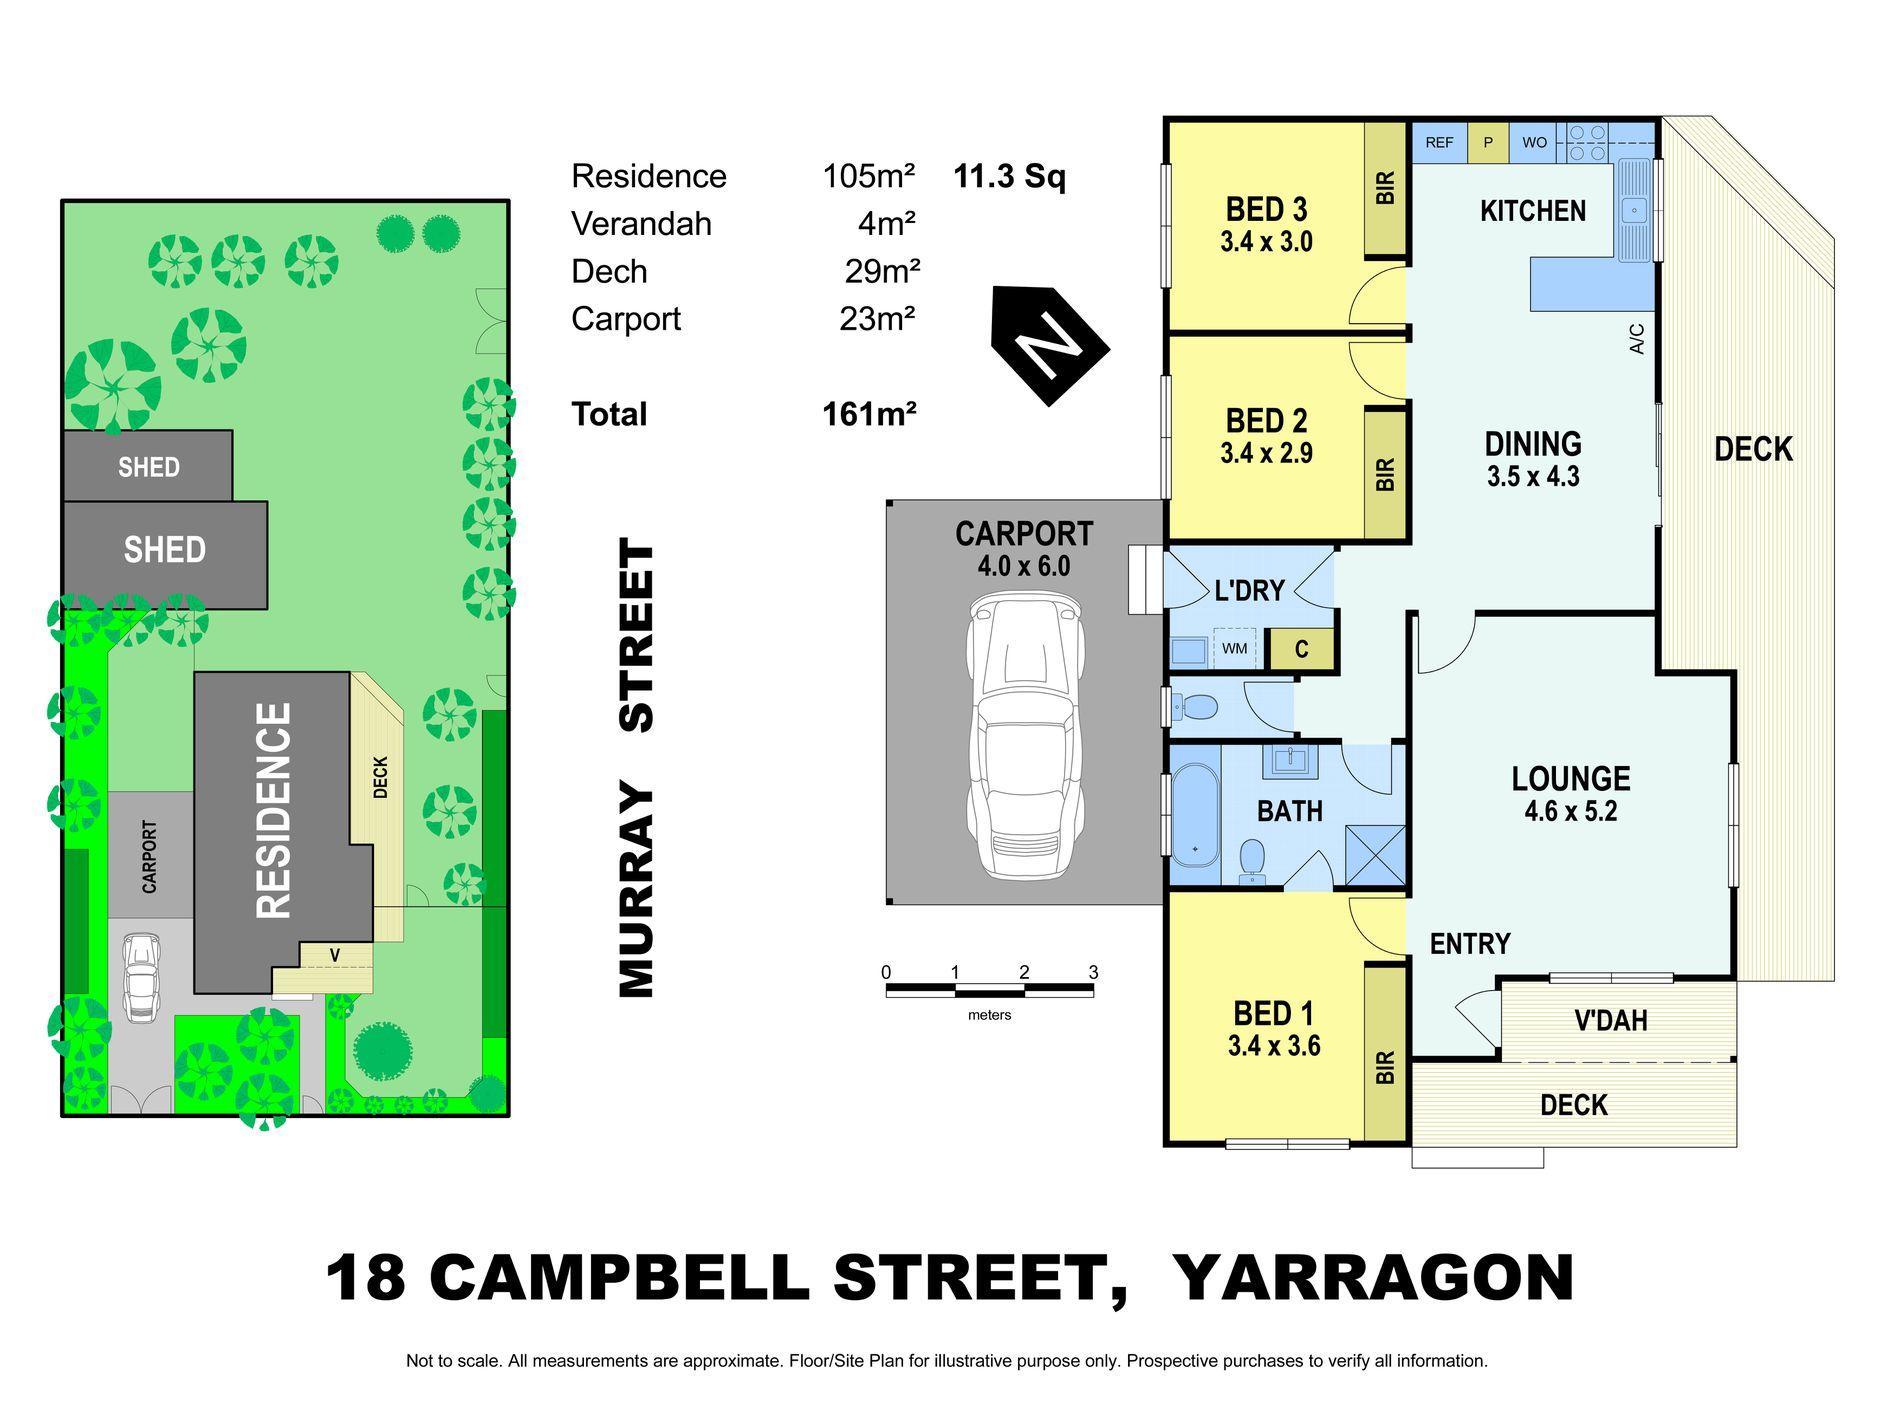 18 Campbell Street, Yarragon